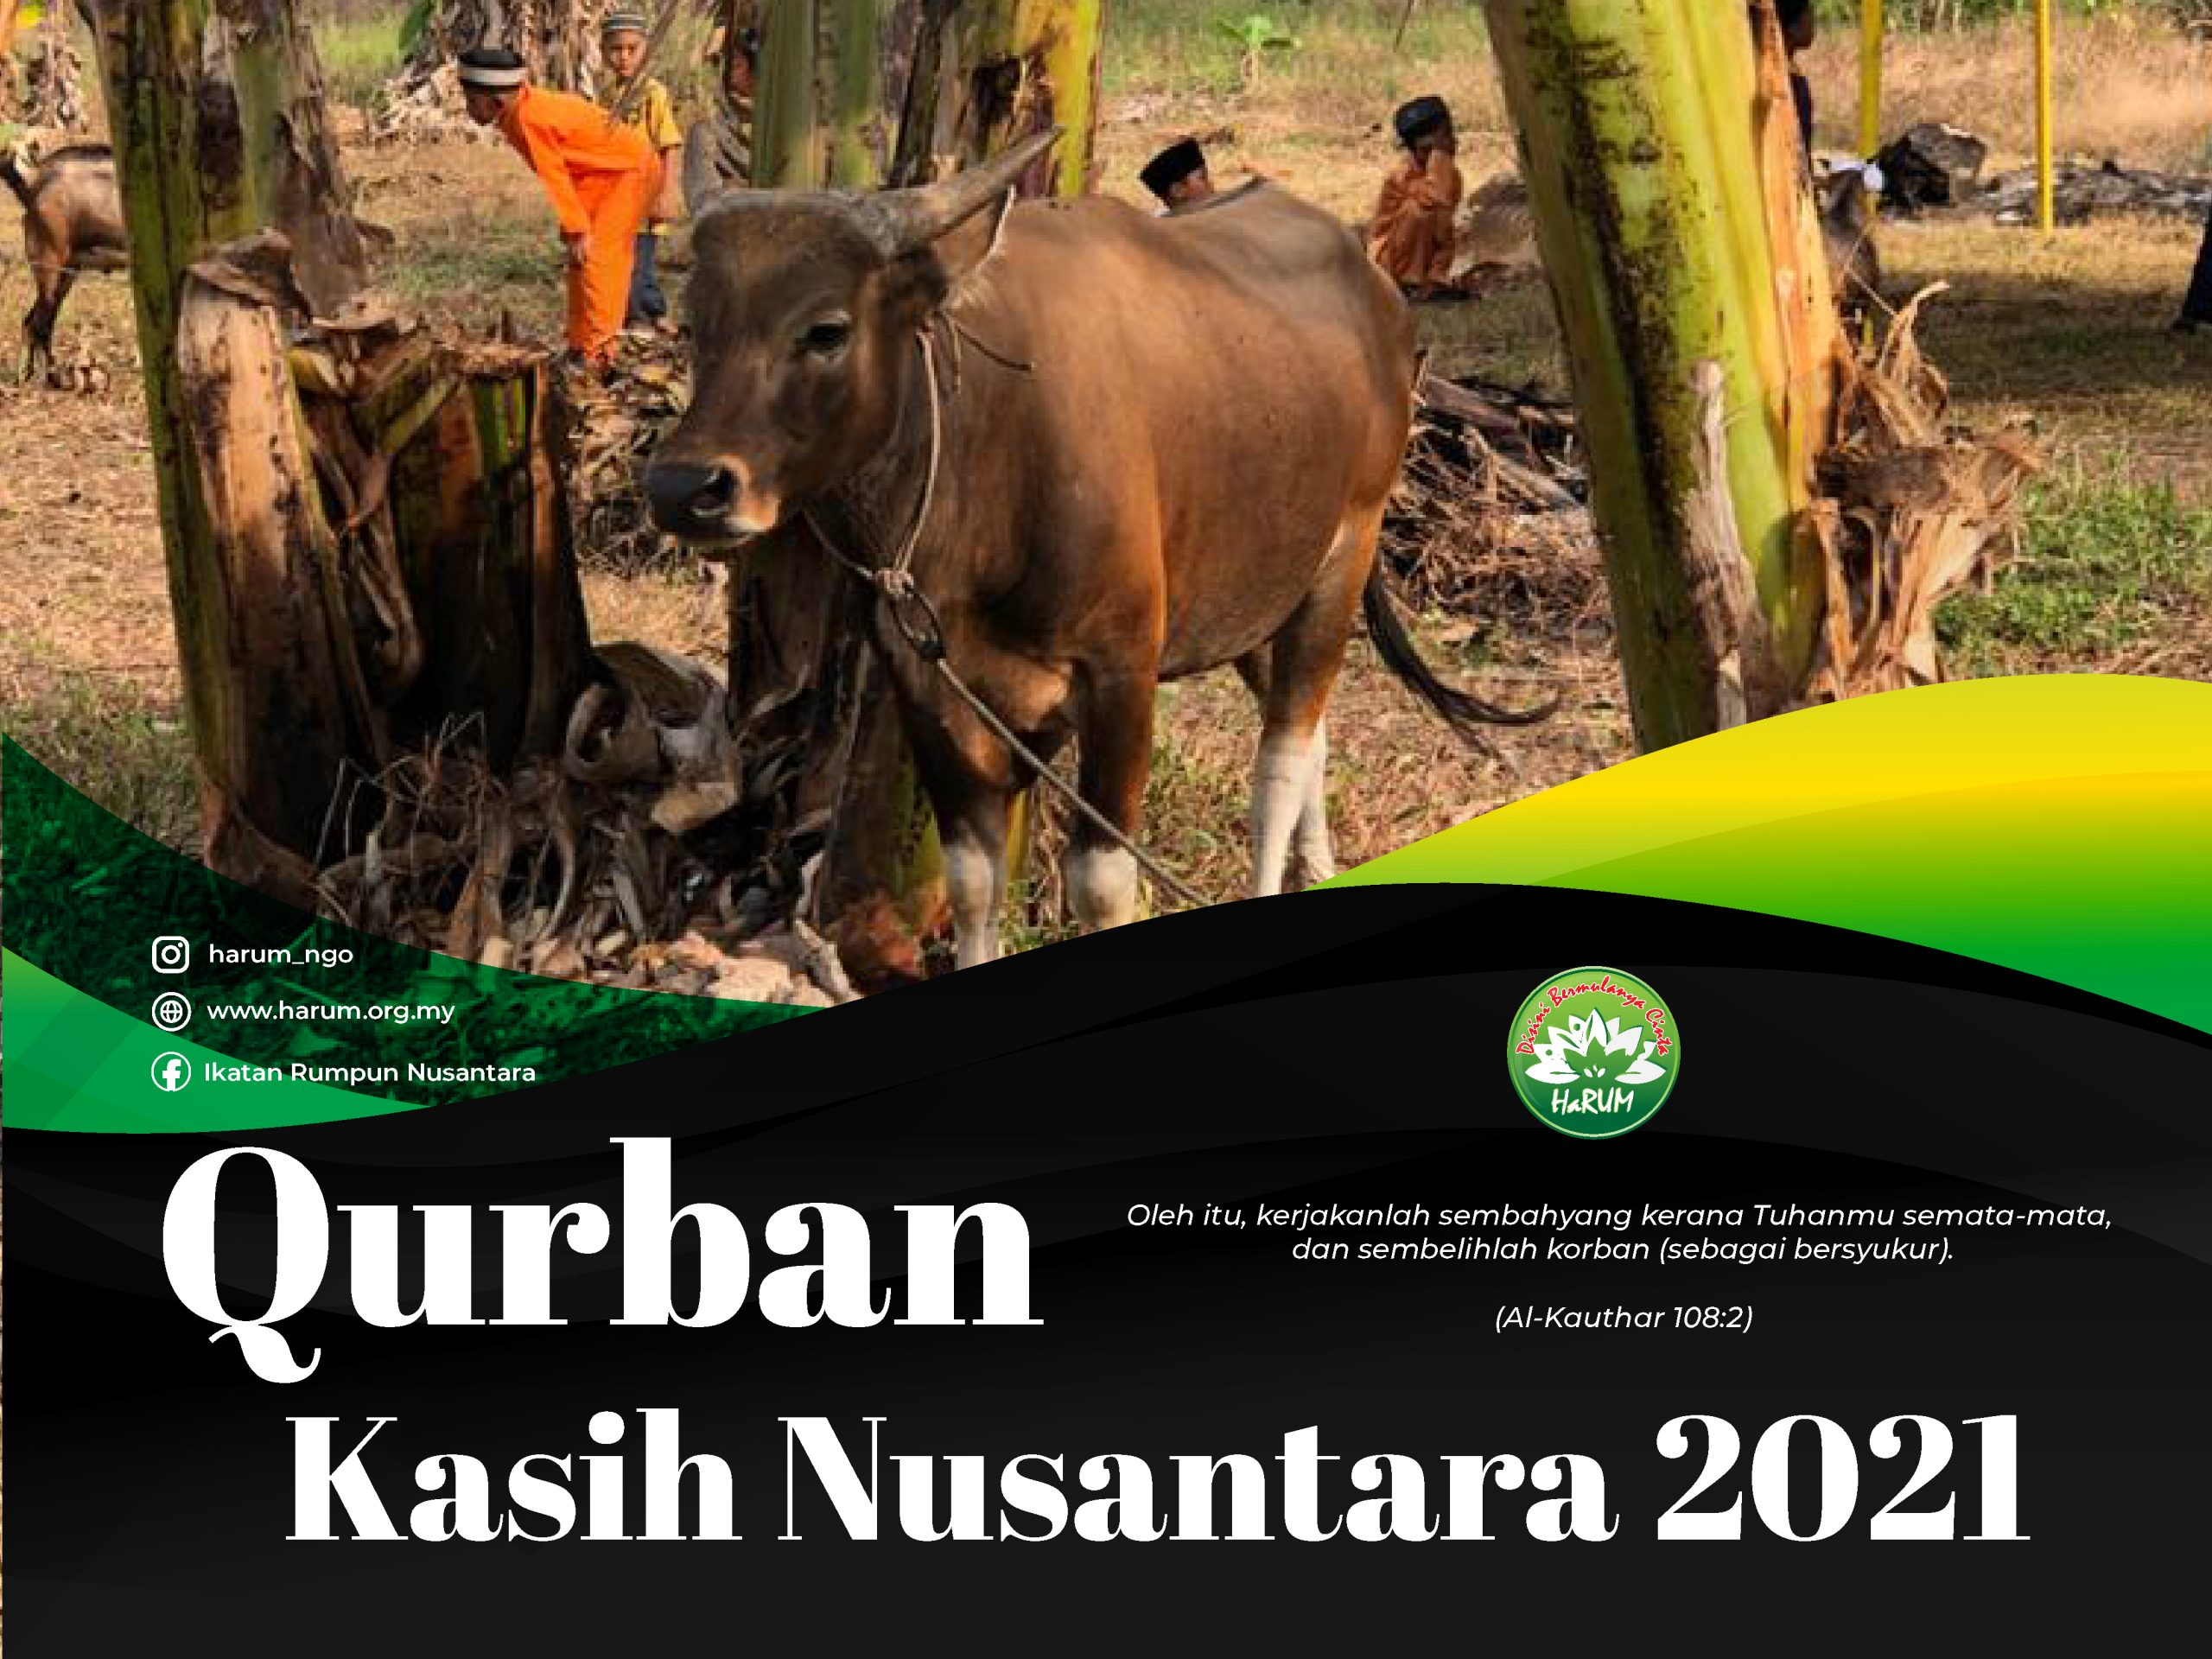 Qurban Kasih Nusantara 2021